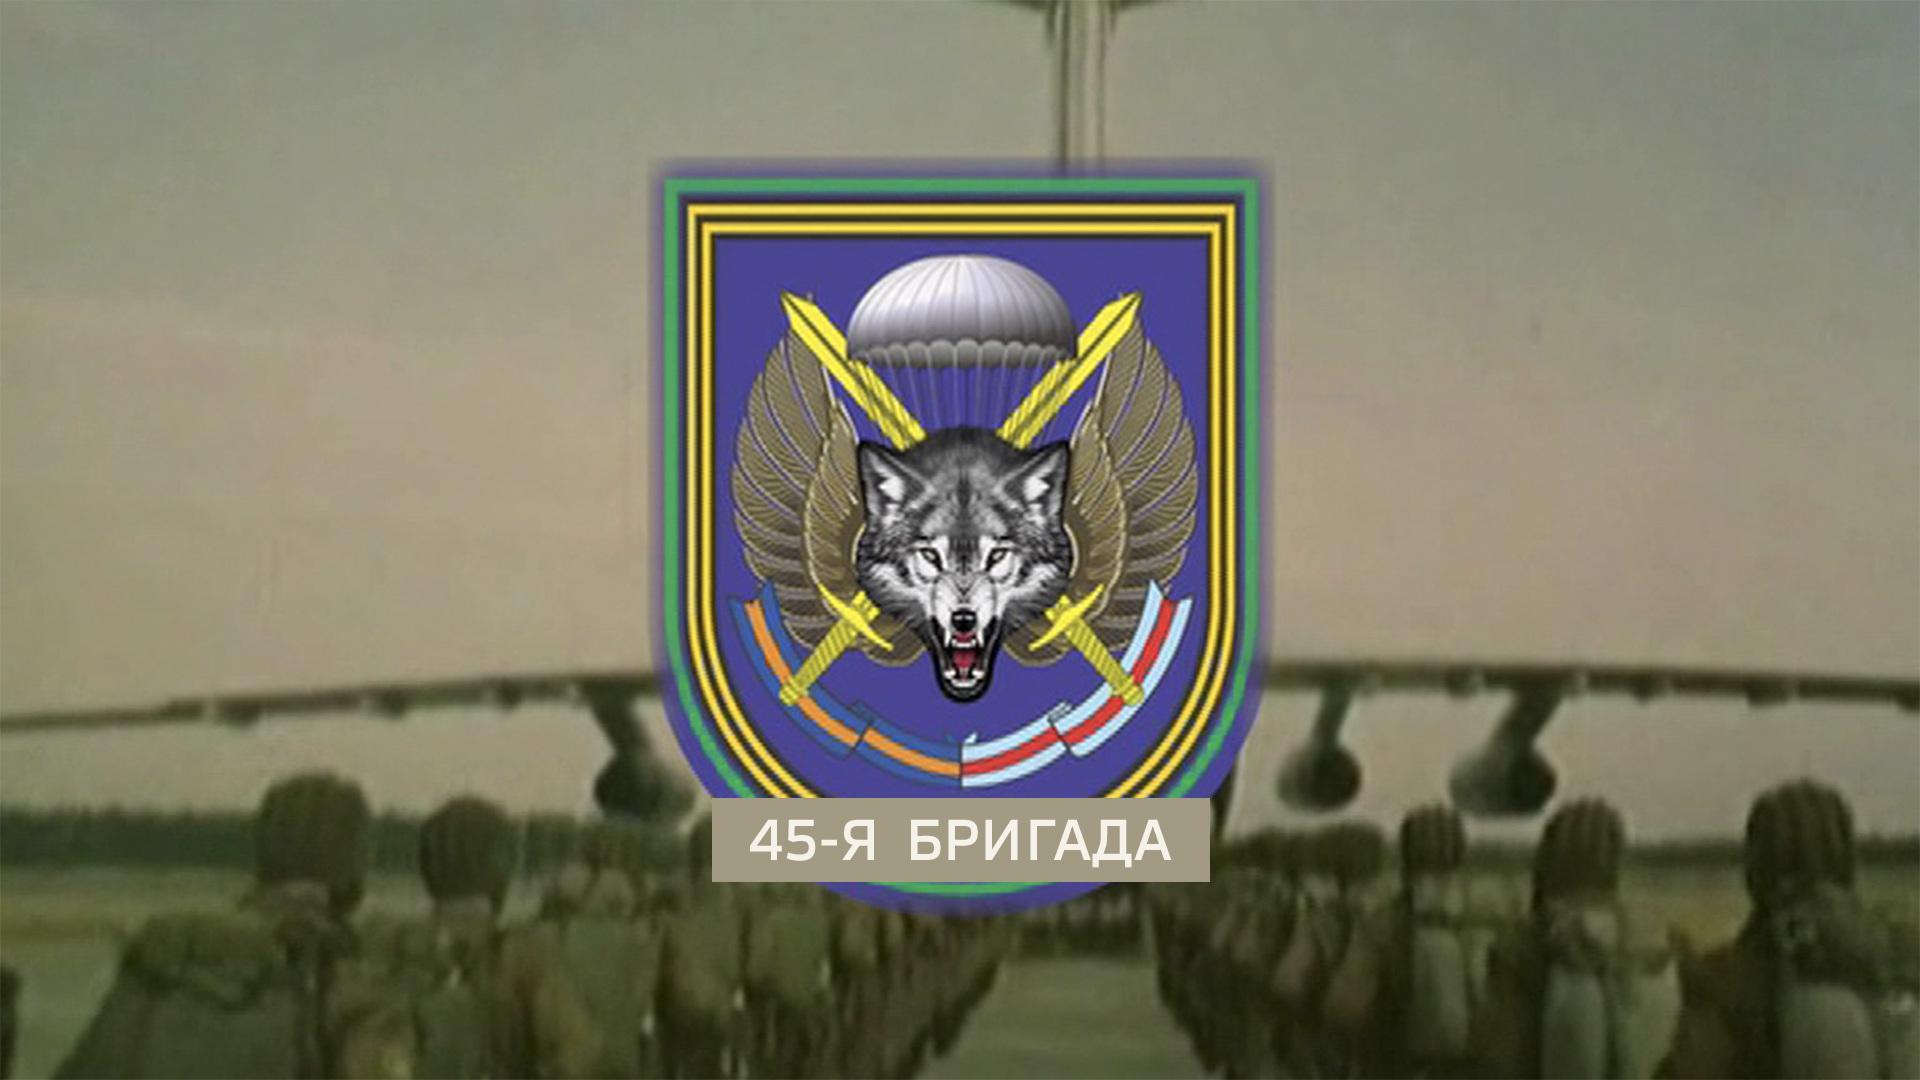 45-я бригада